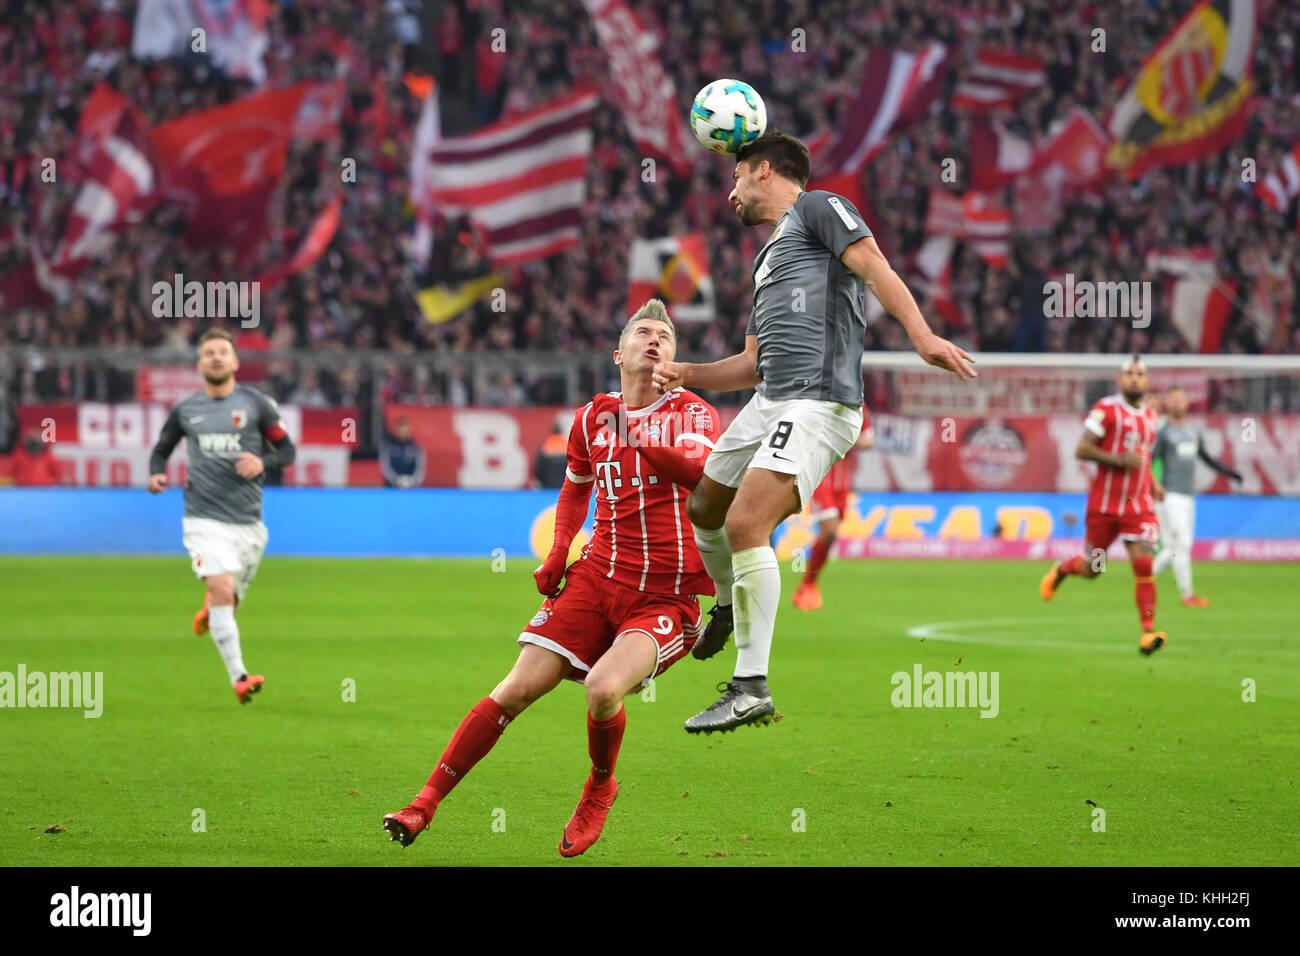 Robert LEWANDOWSKI (FC Bayern Munich), Aktion, duels versus Rani KHEDIRA (FC Augsburg). Fussball 1. Bundesliga, - Stock Image